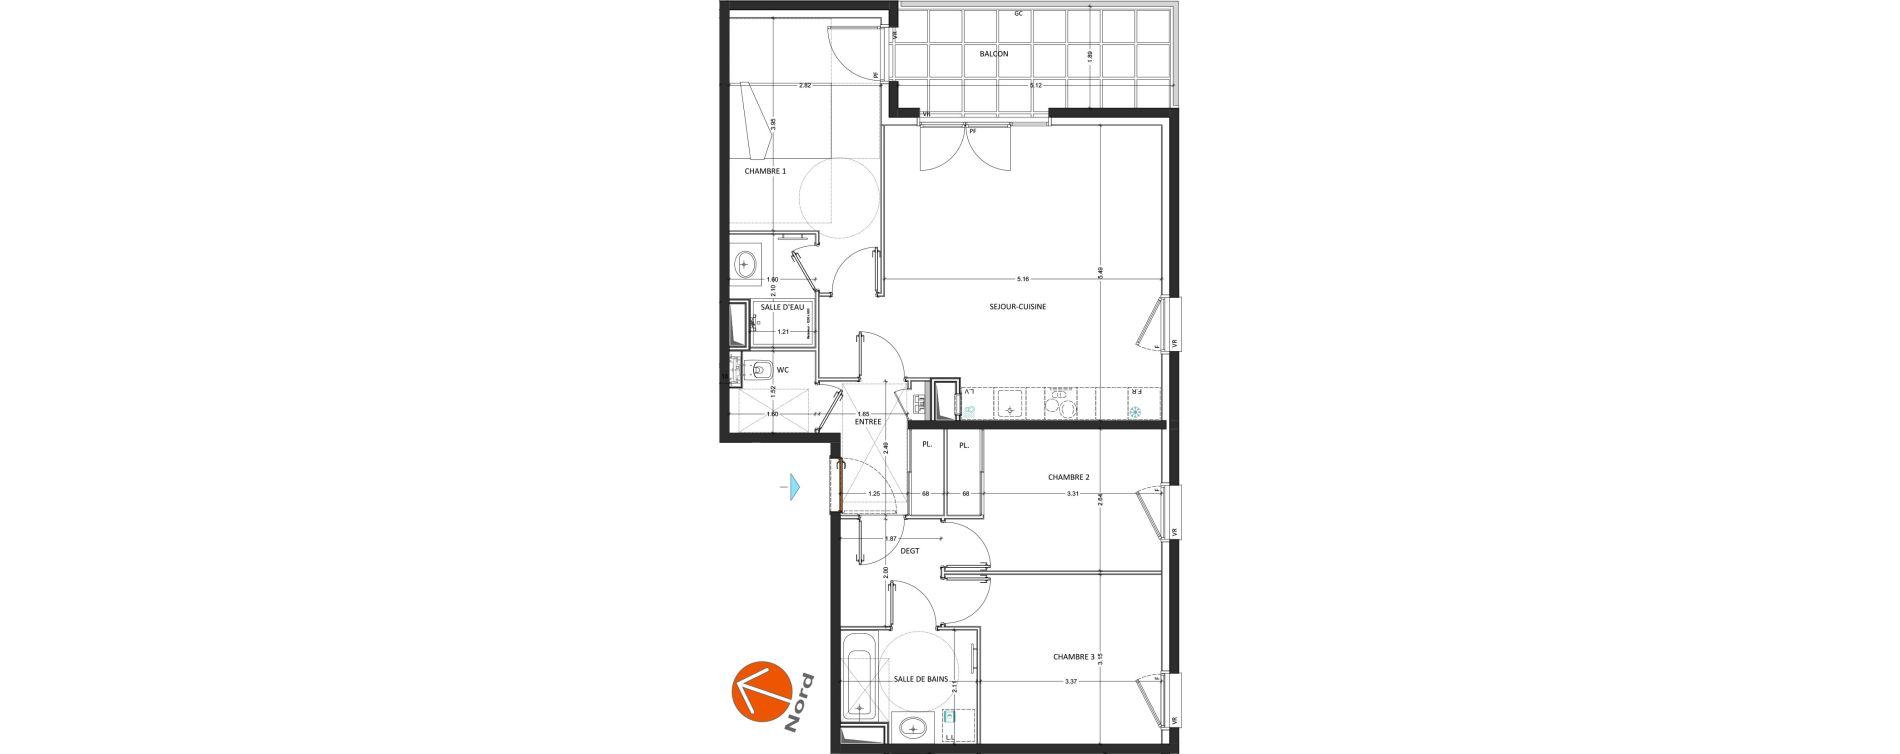 Appartement T4 de 81,53 m2 à Annecy Annecy seynod